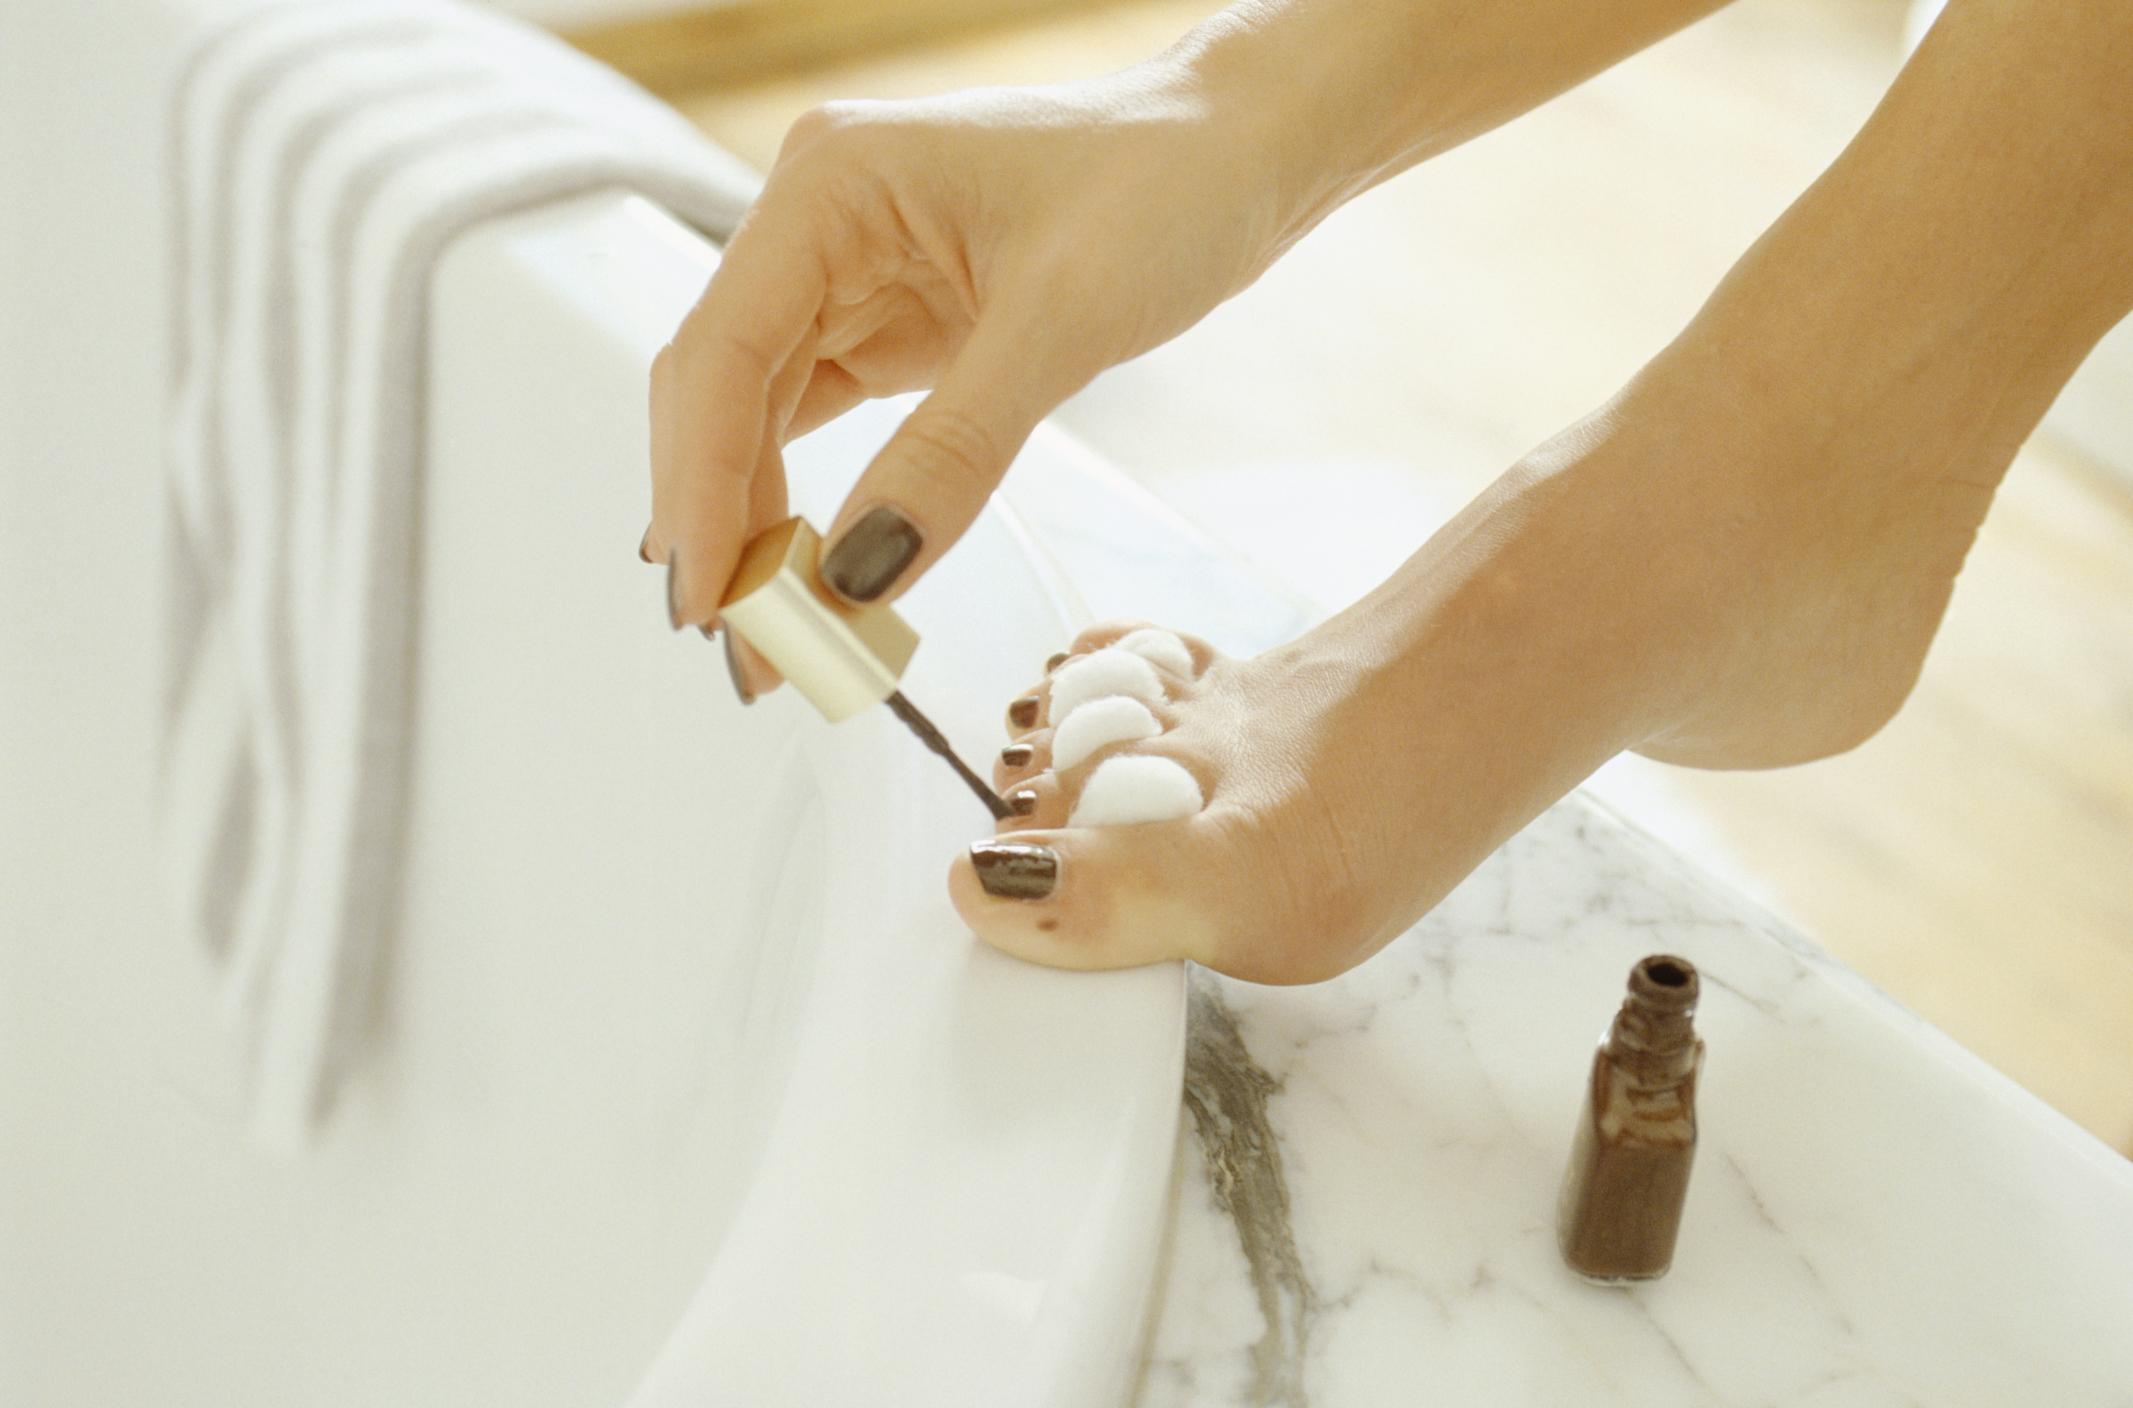 Allergies to Fingernail Polish & Headaches | LIVESTRONG.COM